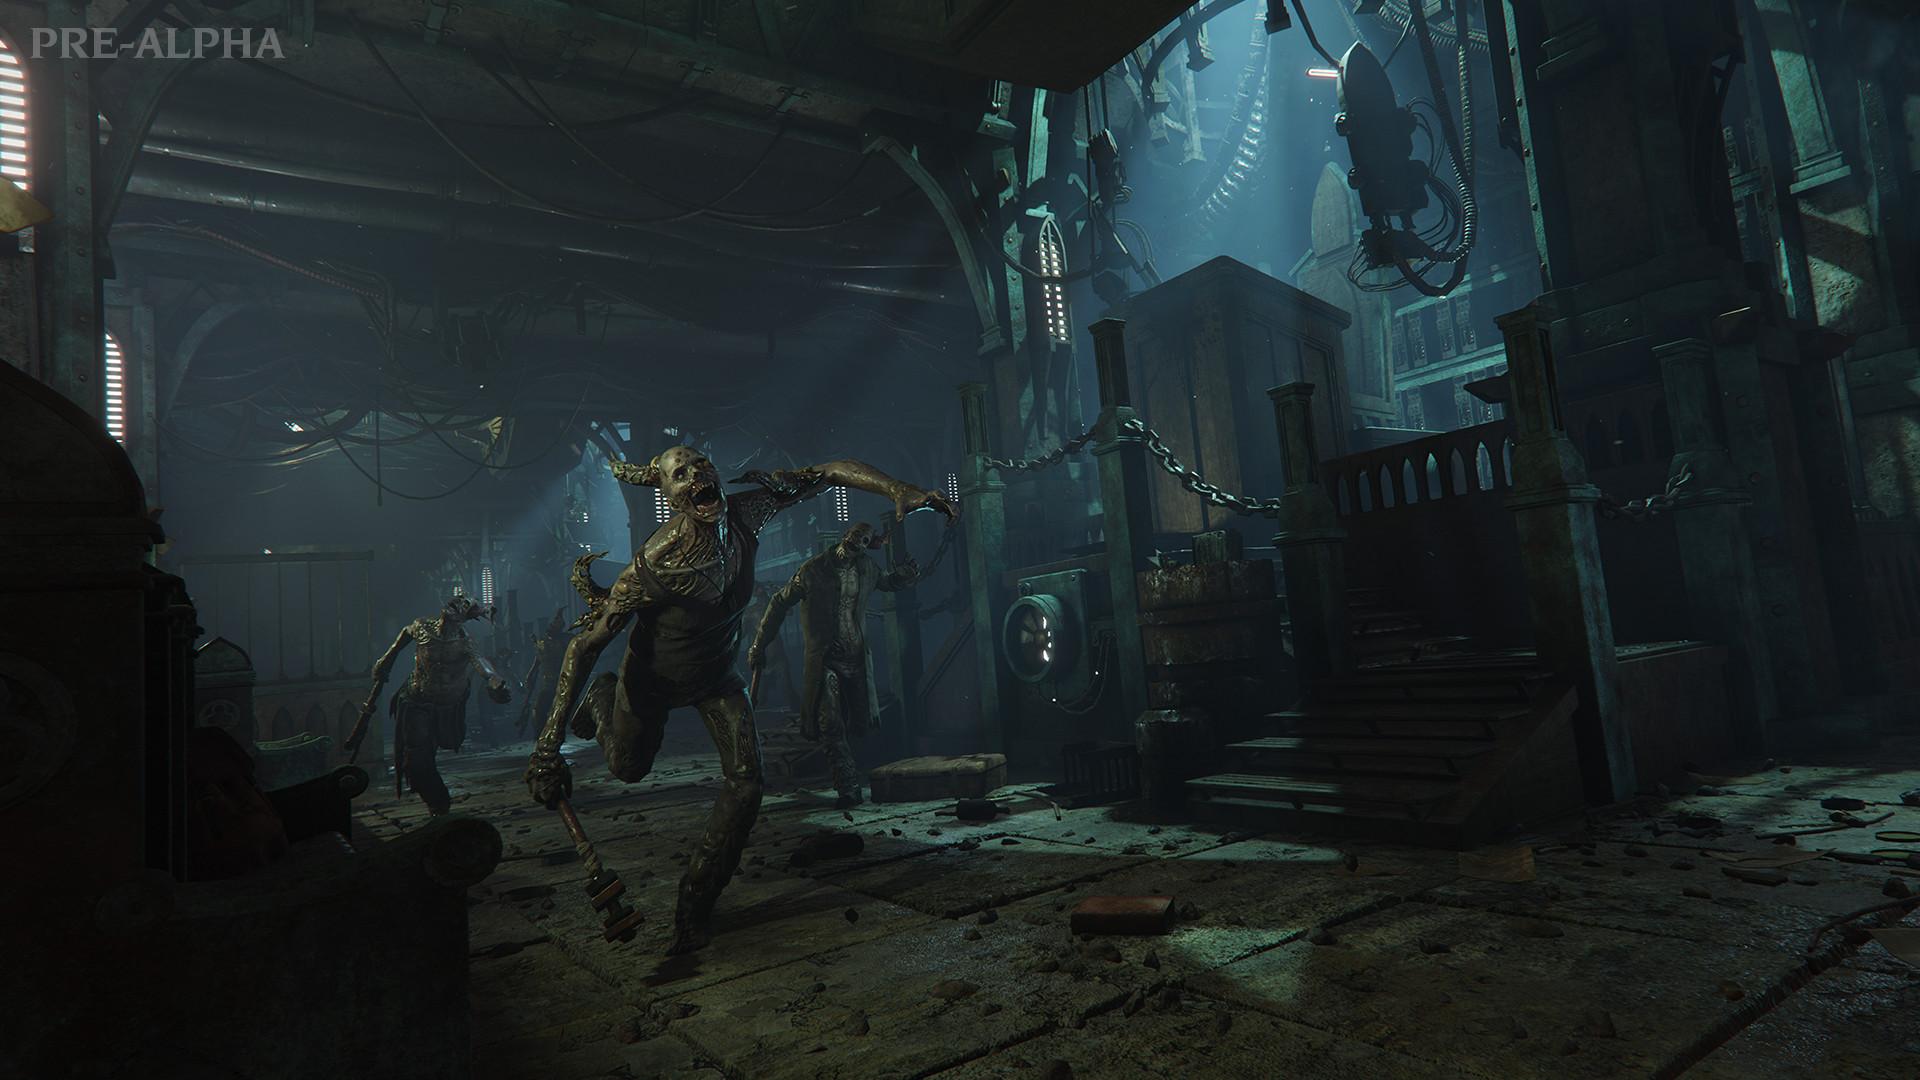 Darktide won't put Vermintide 2 development on the backburner screenshot